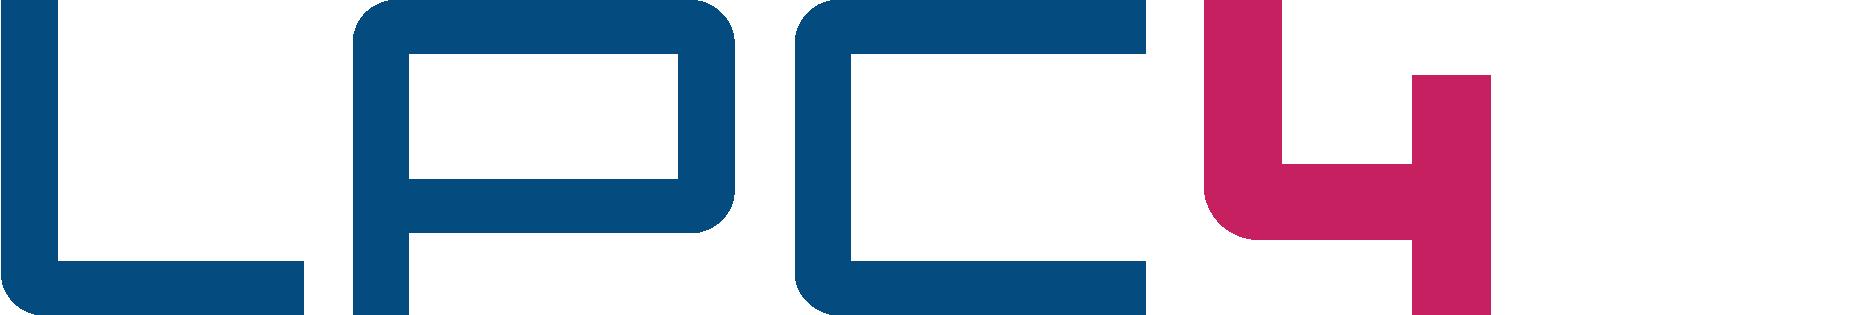 LPC4_logo